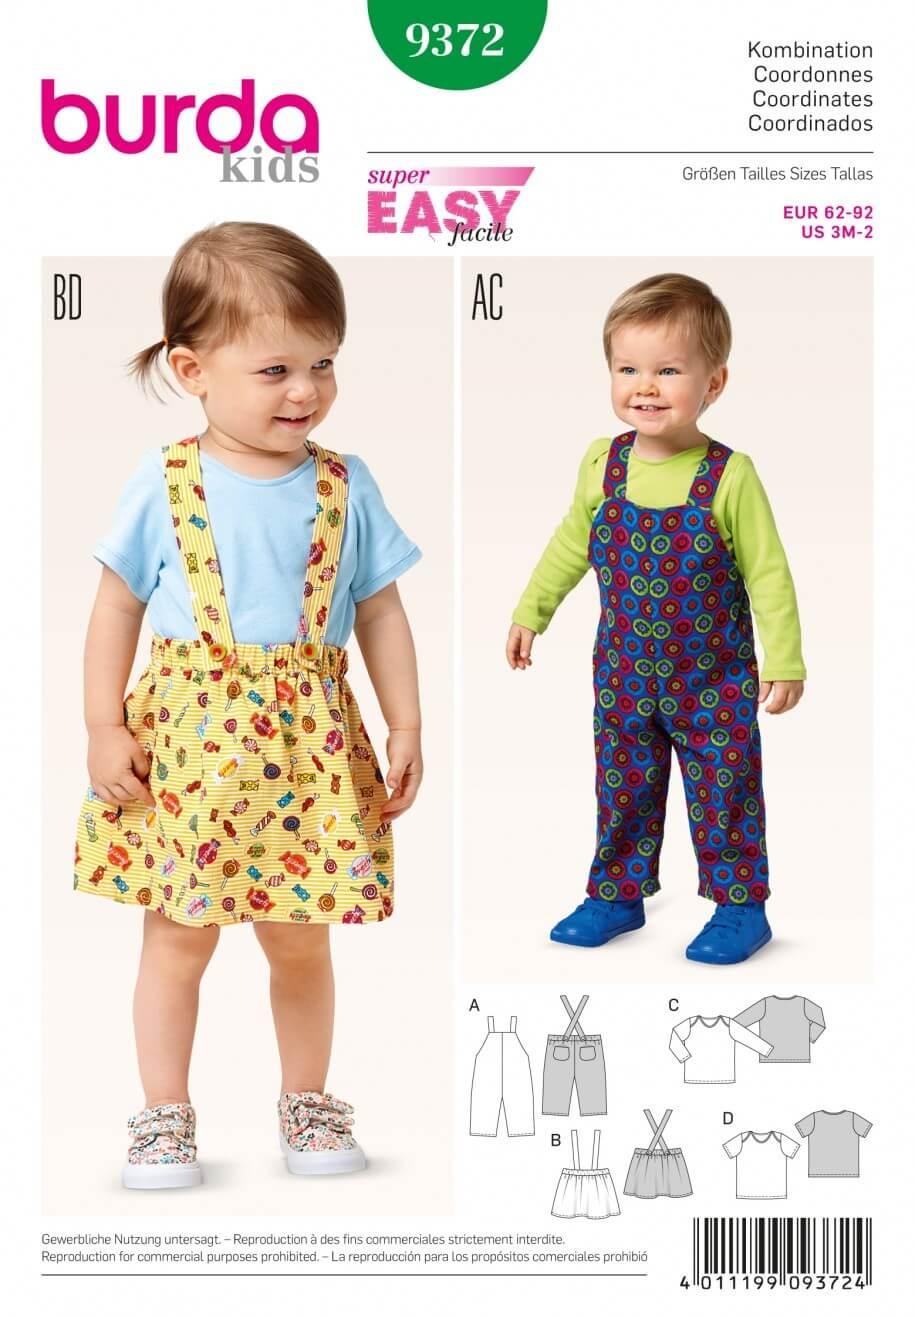 Burda Kids Coordinates Pinafore Style Skirt Dress Sewing Pattern 9372